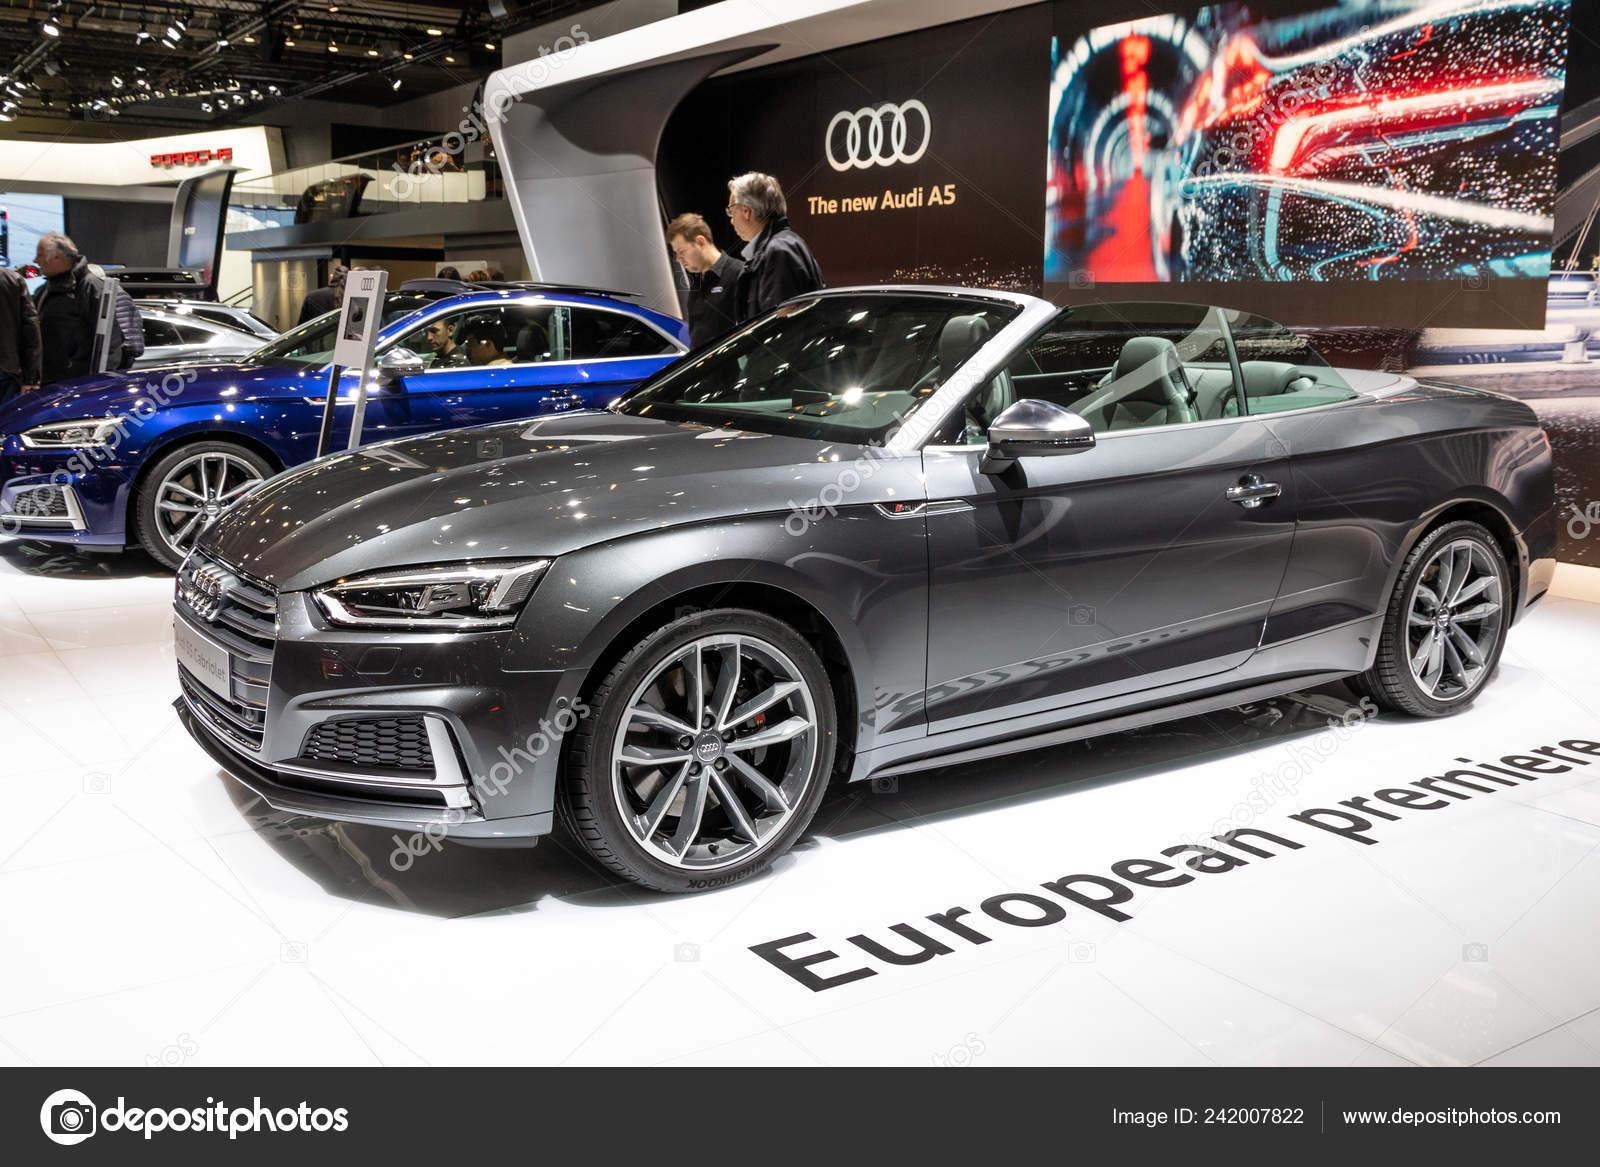 Bruxelas Jan 2017 Novo Carro Audi Cabriolet Exposicao Salao Automovel Fotografia De Stock Editorial C Foto Vdw 242007822